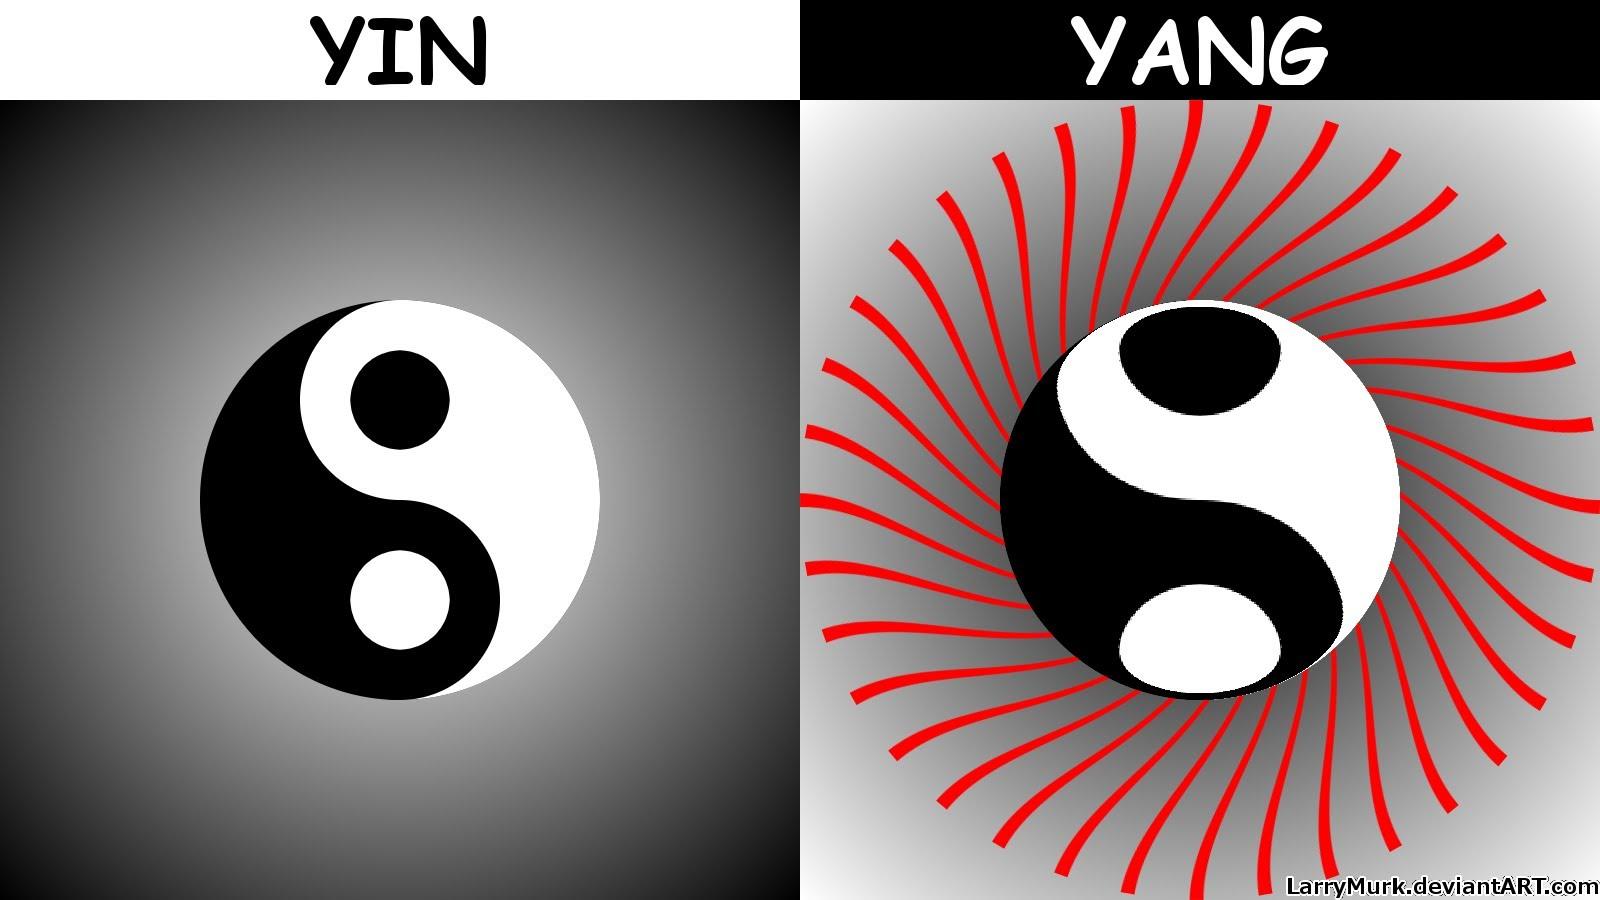 1600x900 Yin Yang Chinese Symbol Draw Gimp